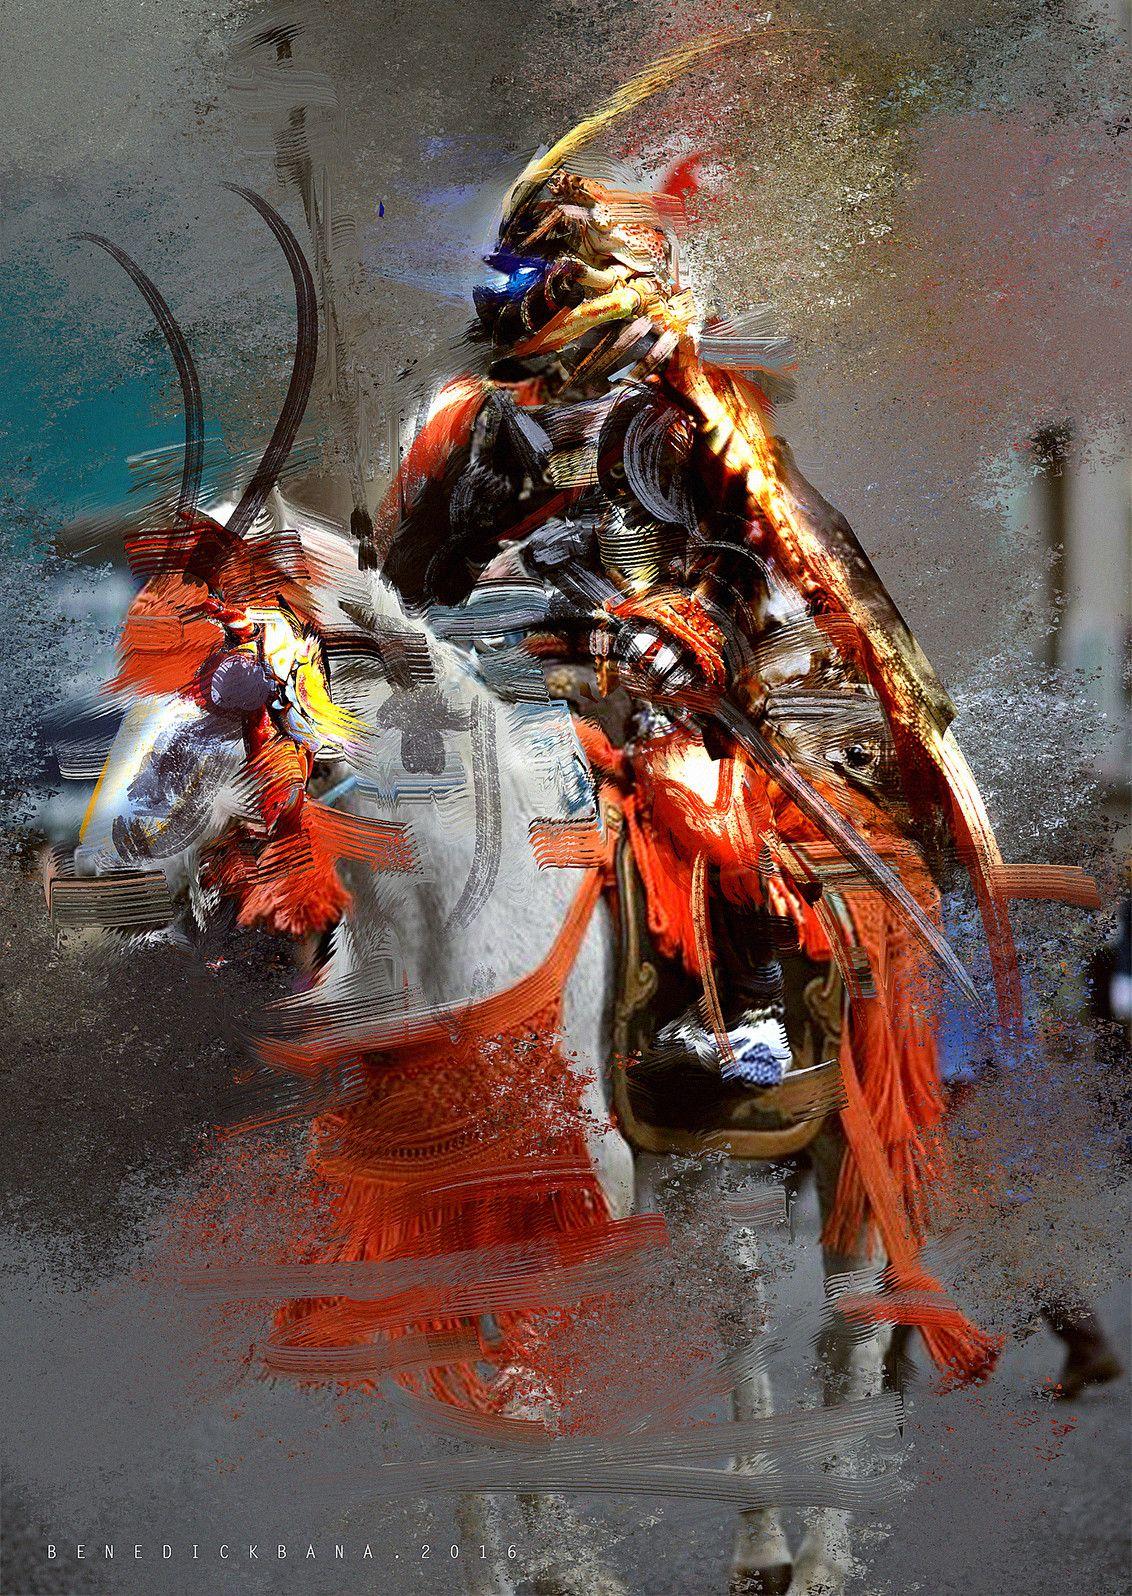 Samurai Crab Armor, Benedick Bana on ArtStation at https://www.artstation.com/artwork/QGm2x